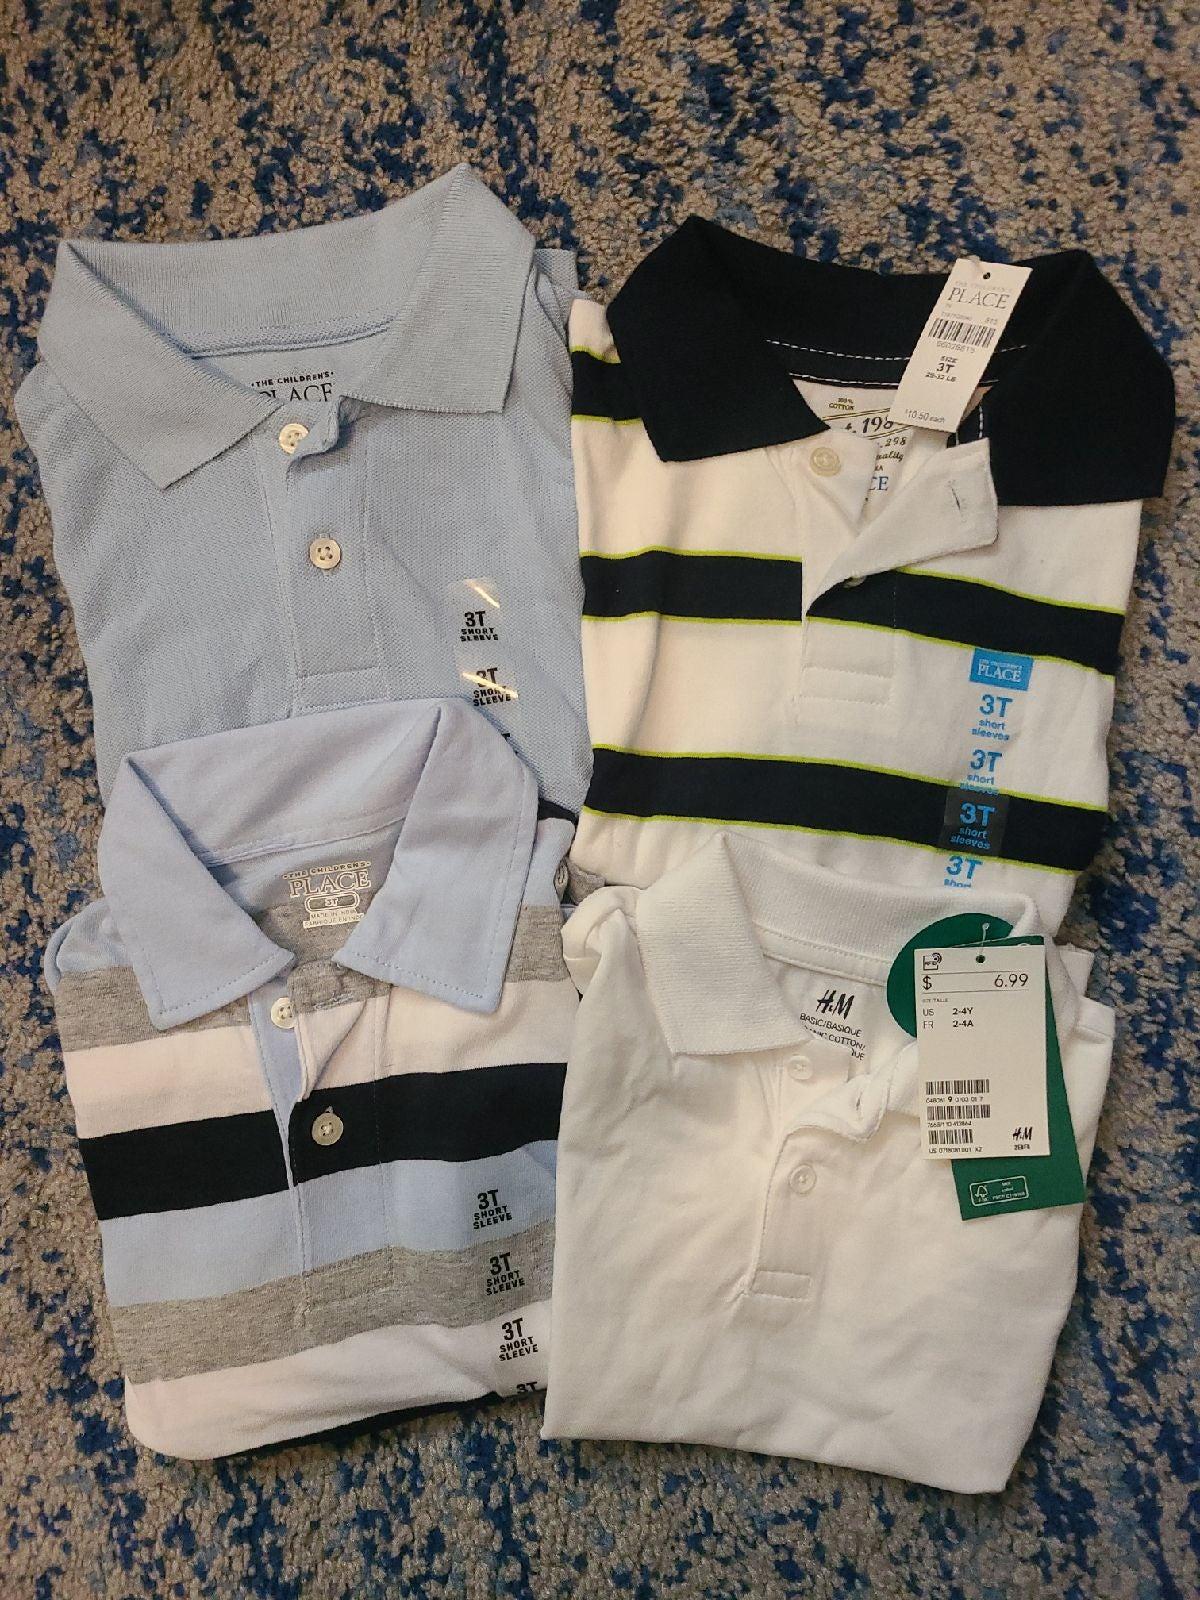 3T boys shirt bundle